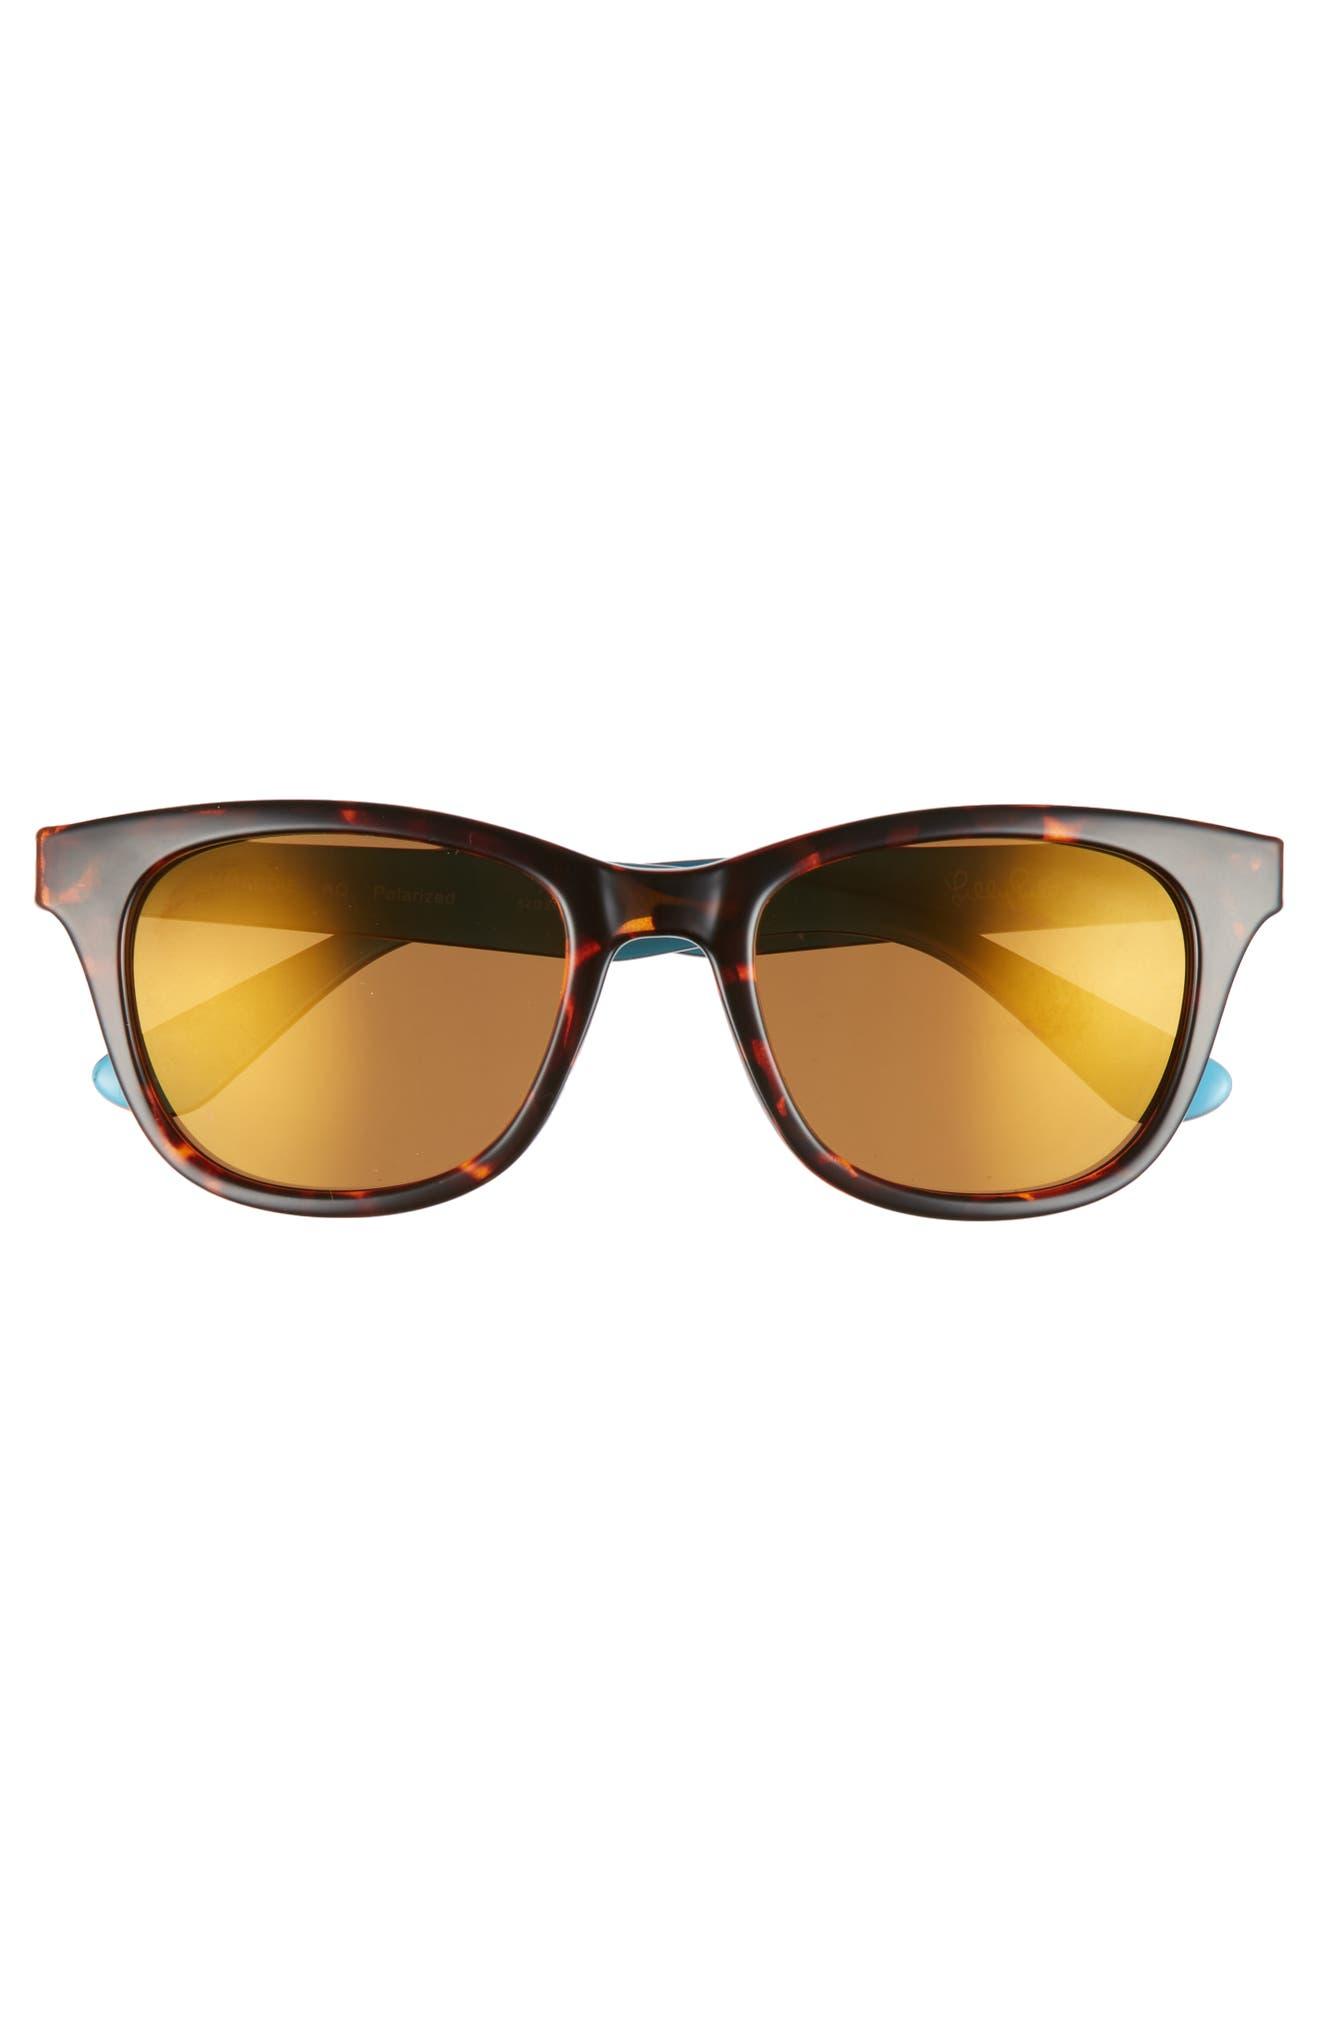 309da495a5 Lilly Pulitzer® Maddie 52mm Polarized Mirrored Sunglasses